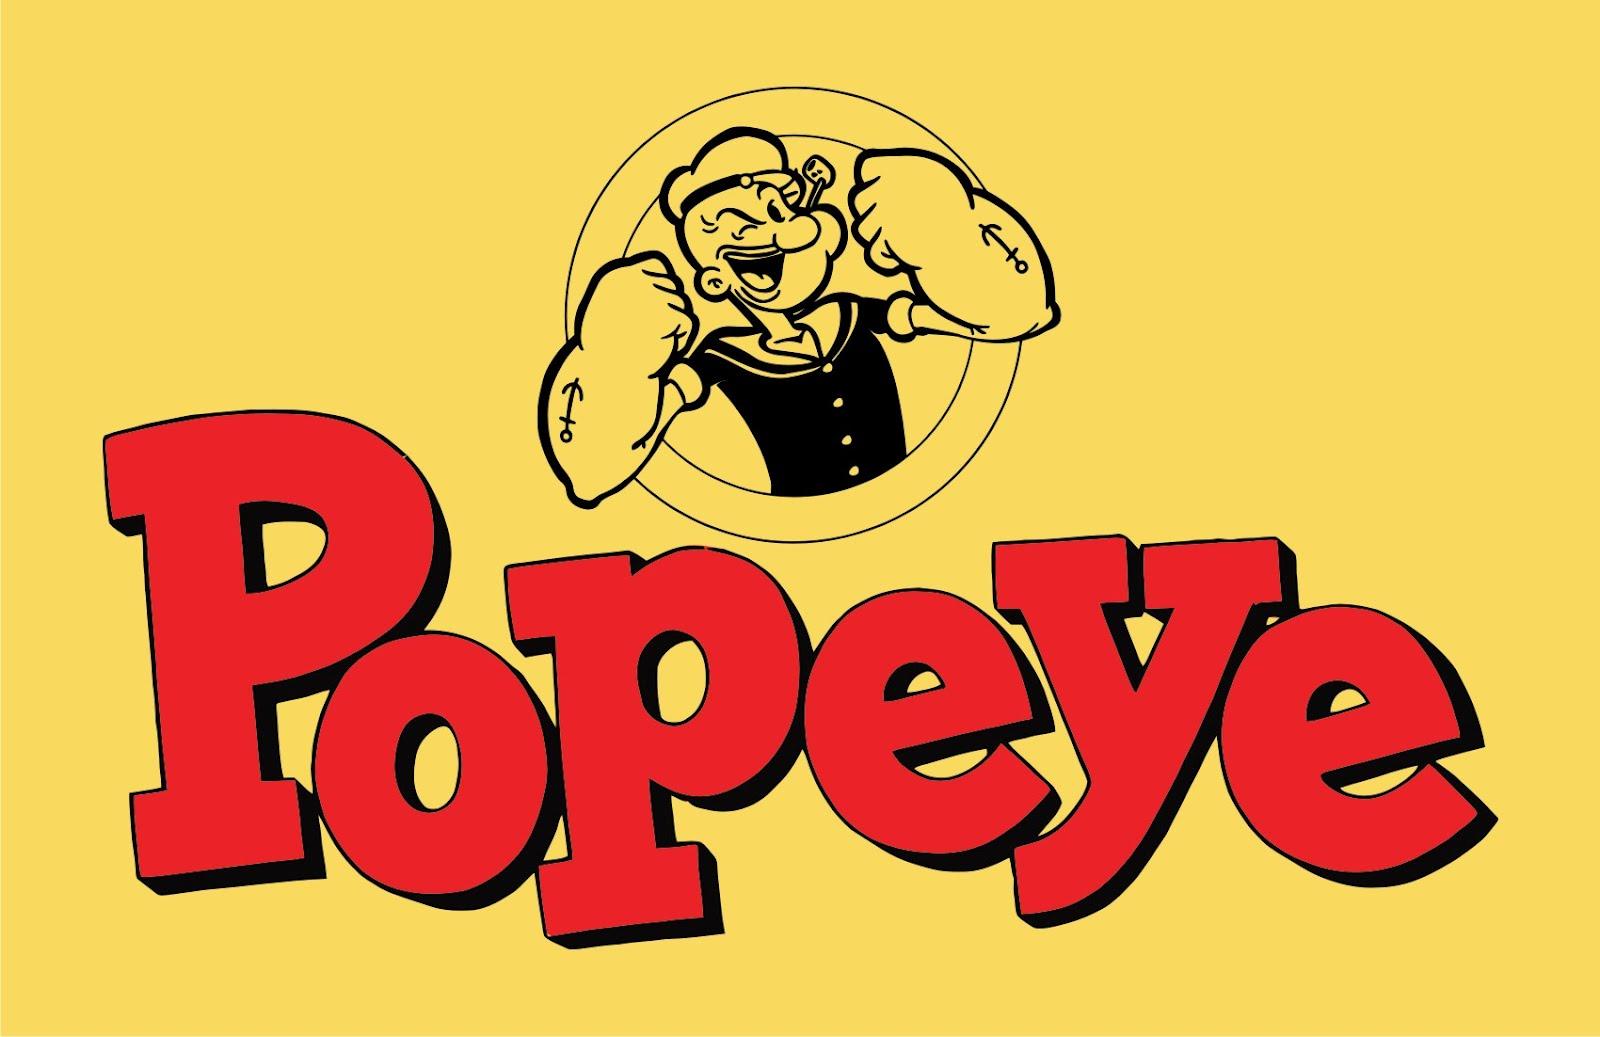 Popeye The Sailorman Vector Game